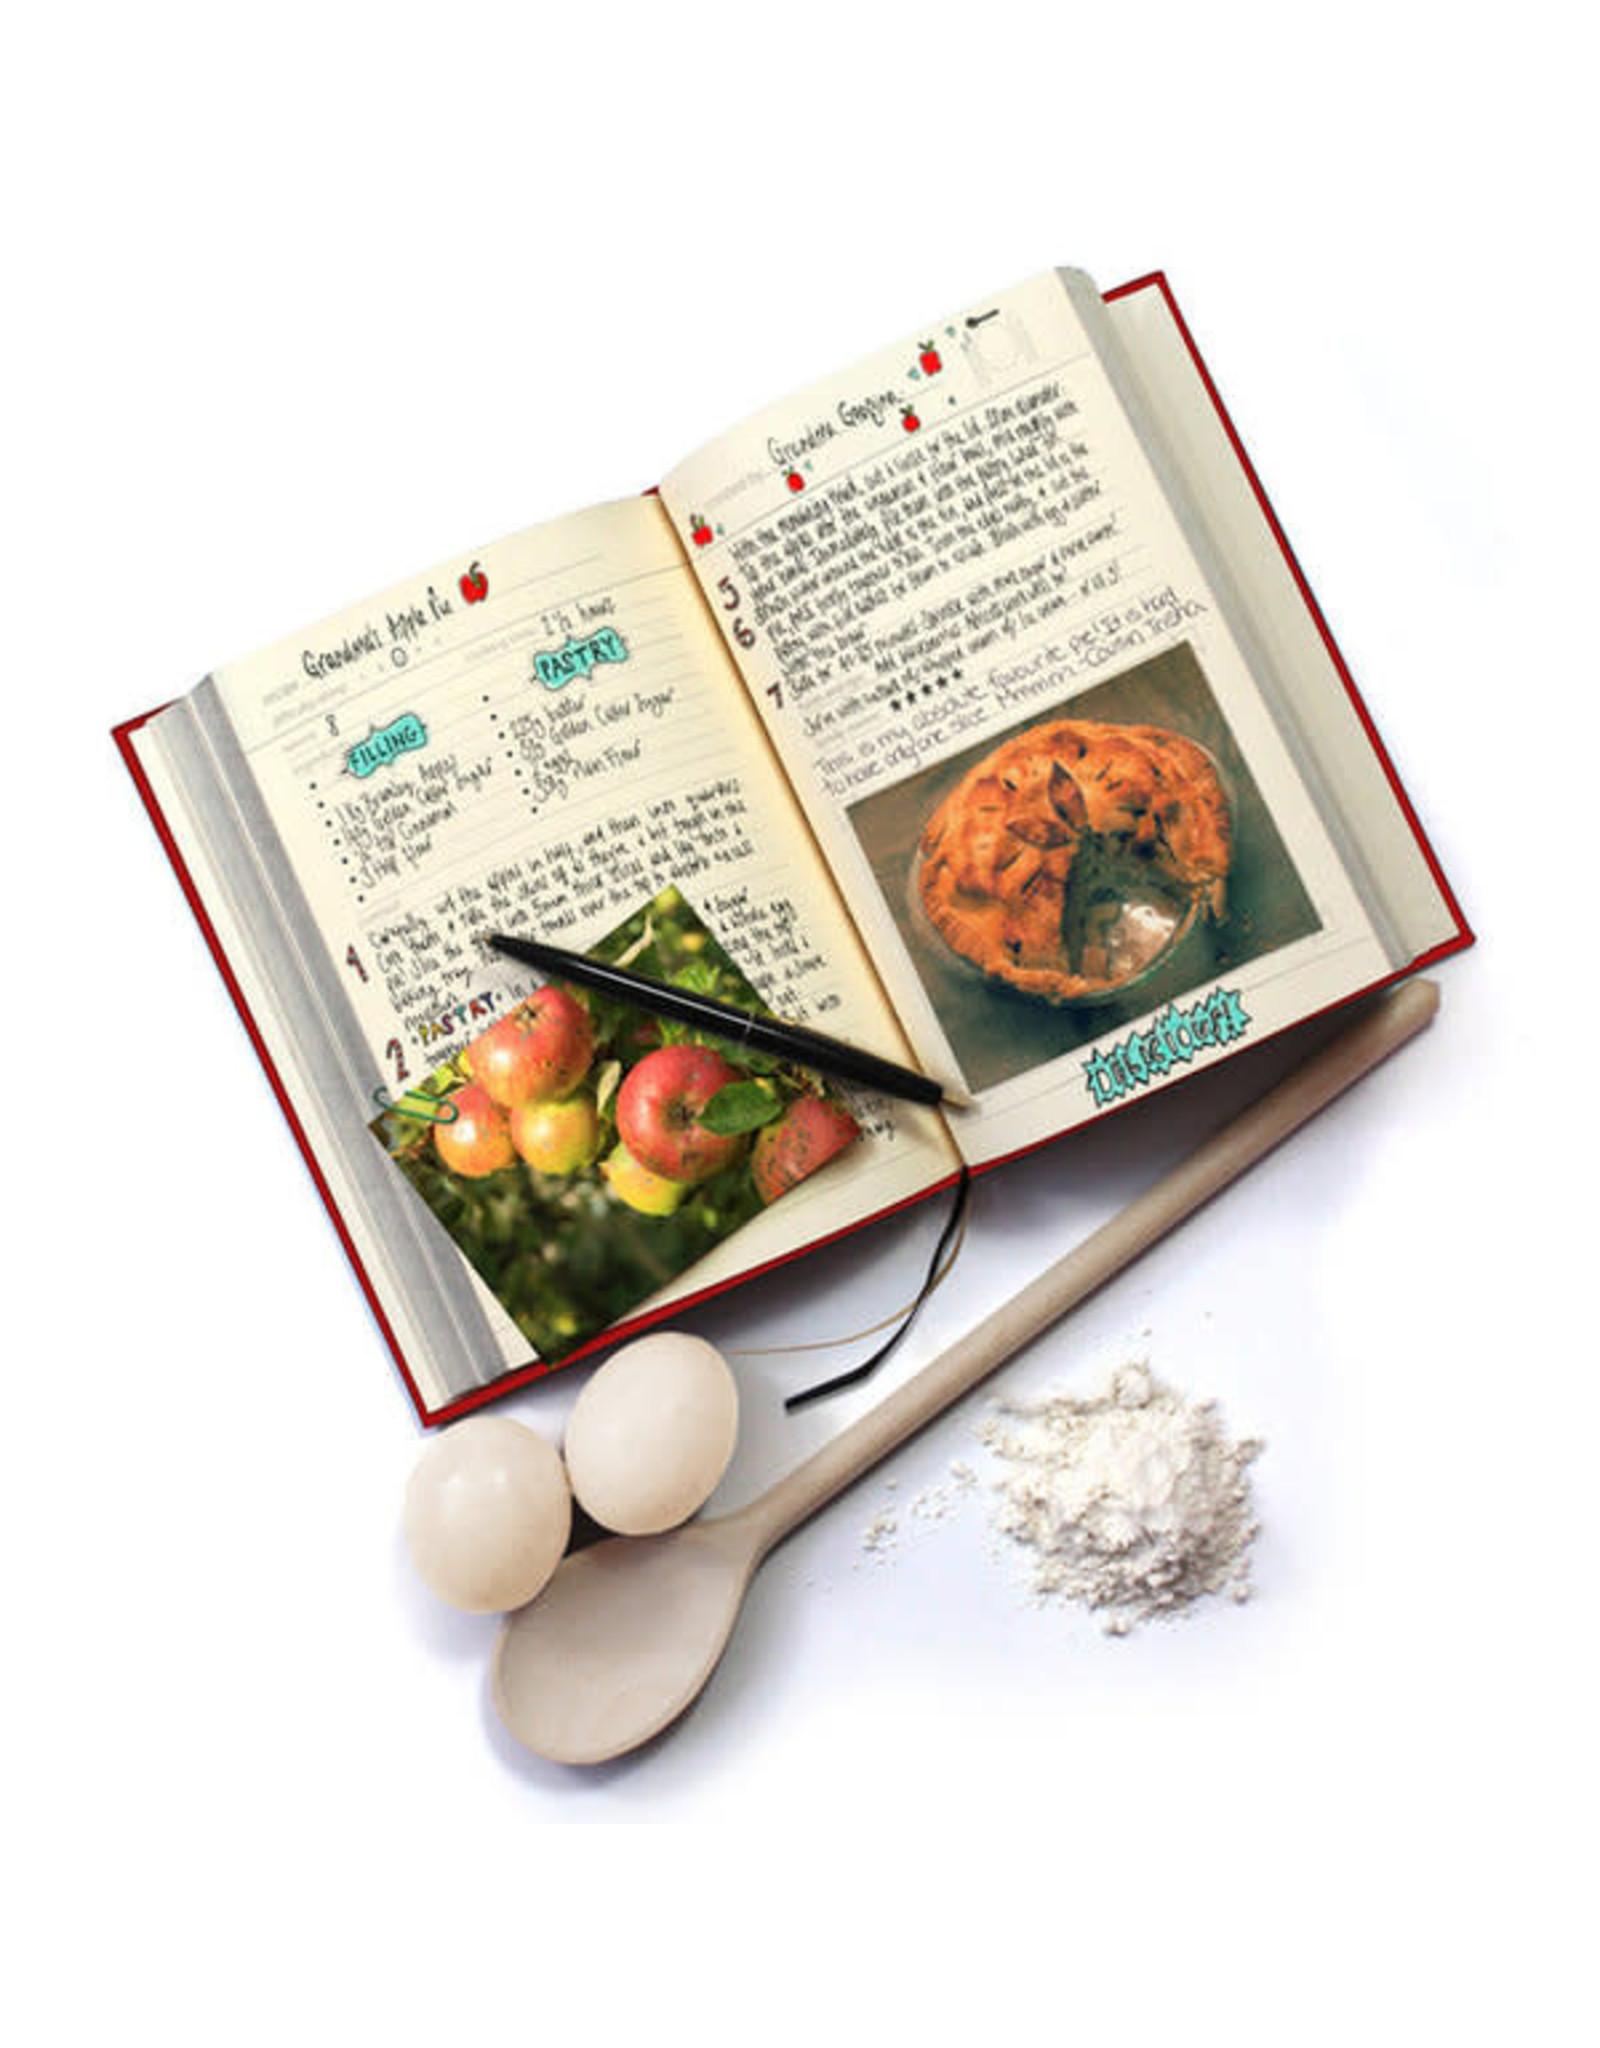 Suck UK My family cook book